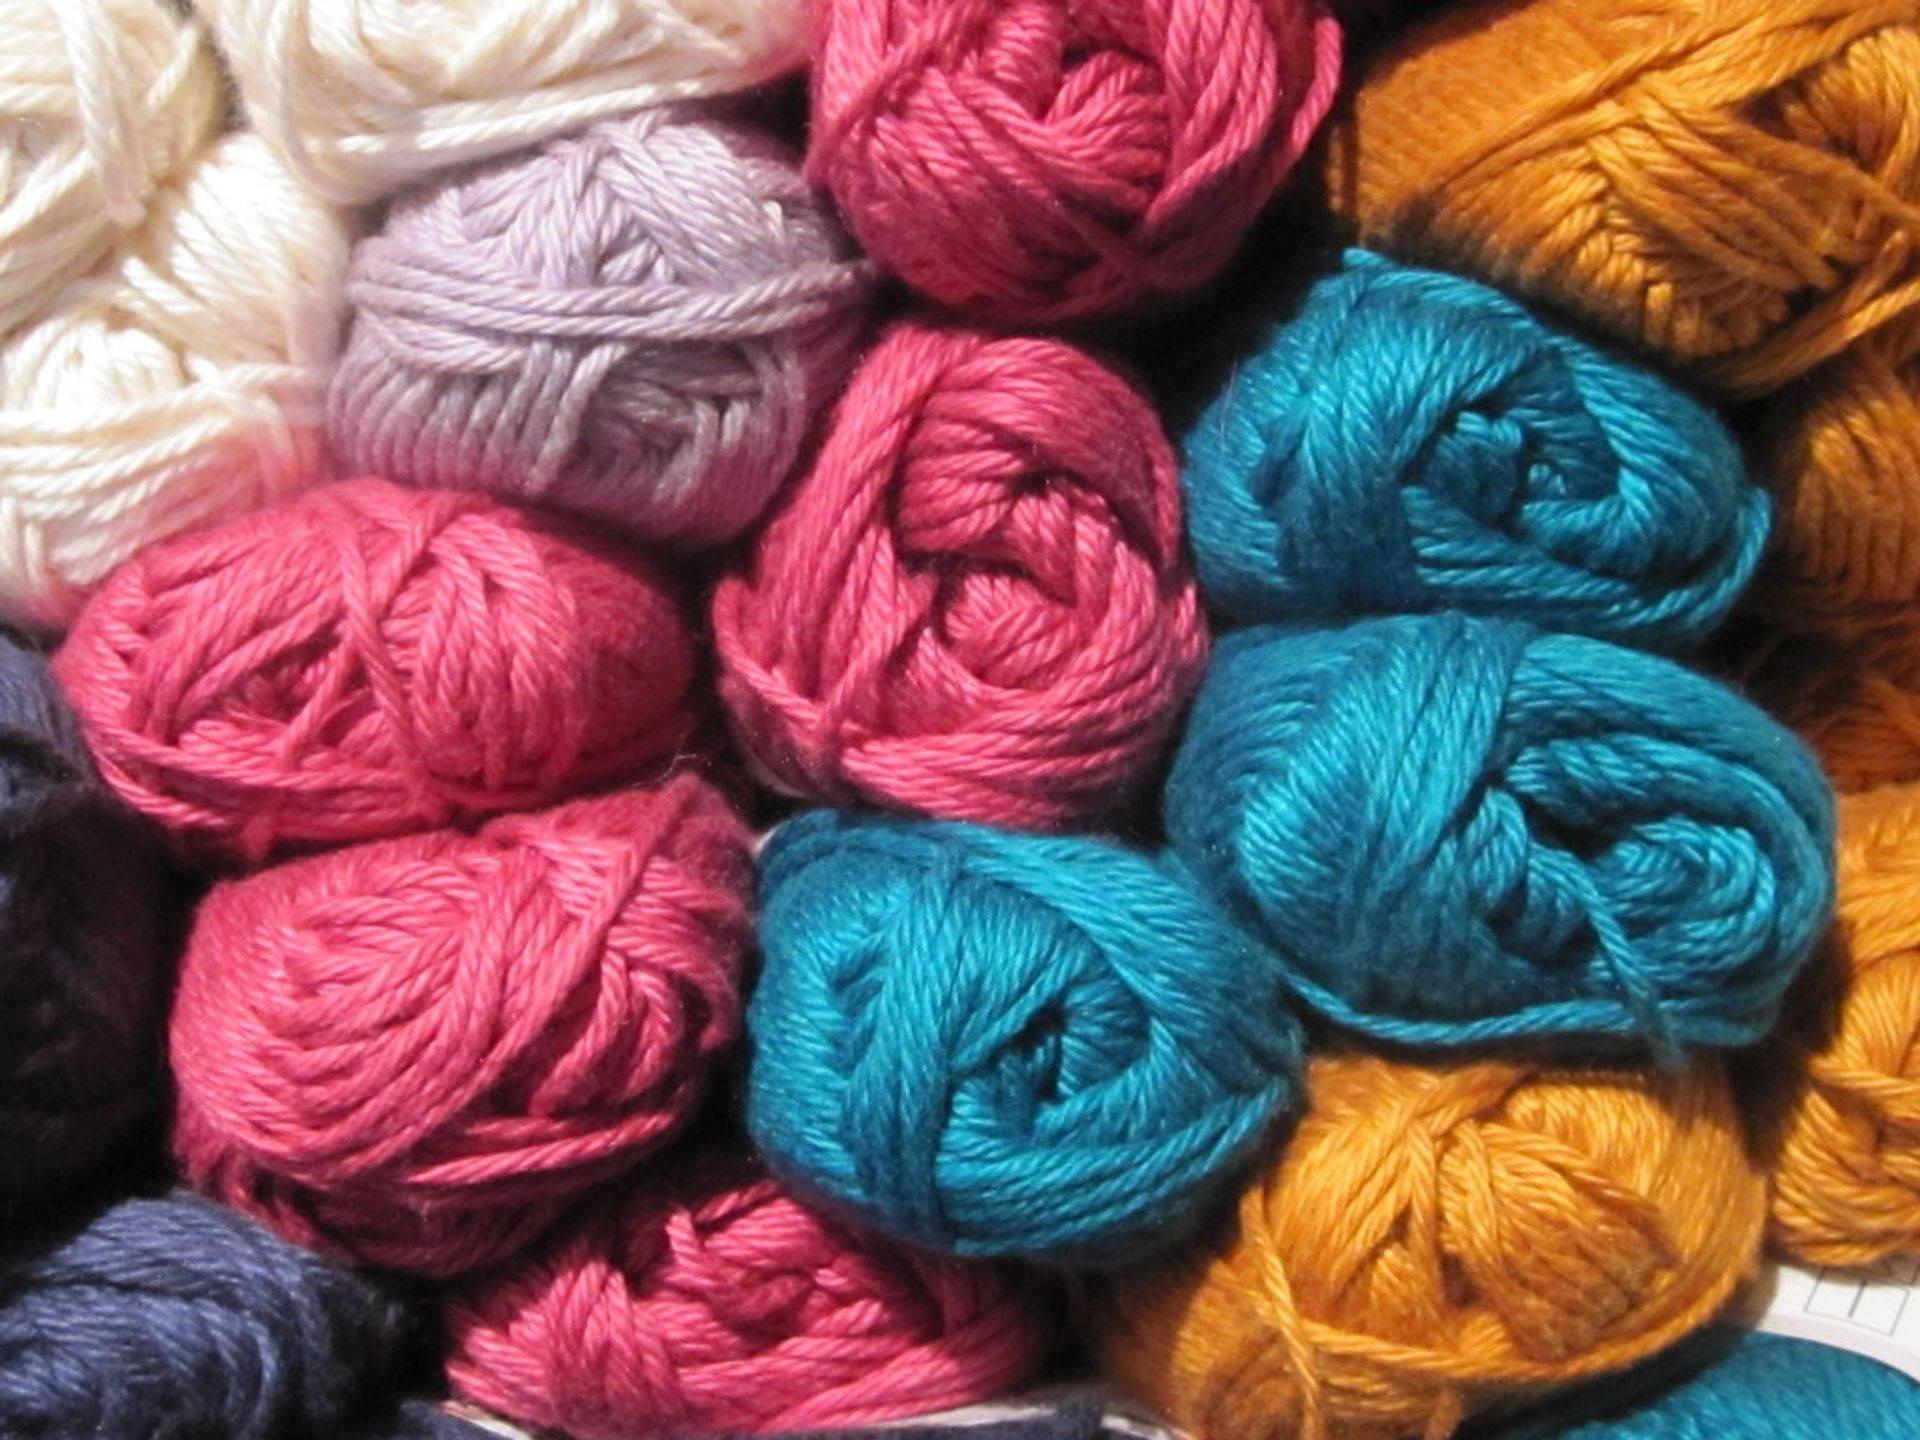 Colourful Spools balls of Yarn